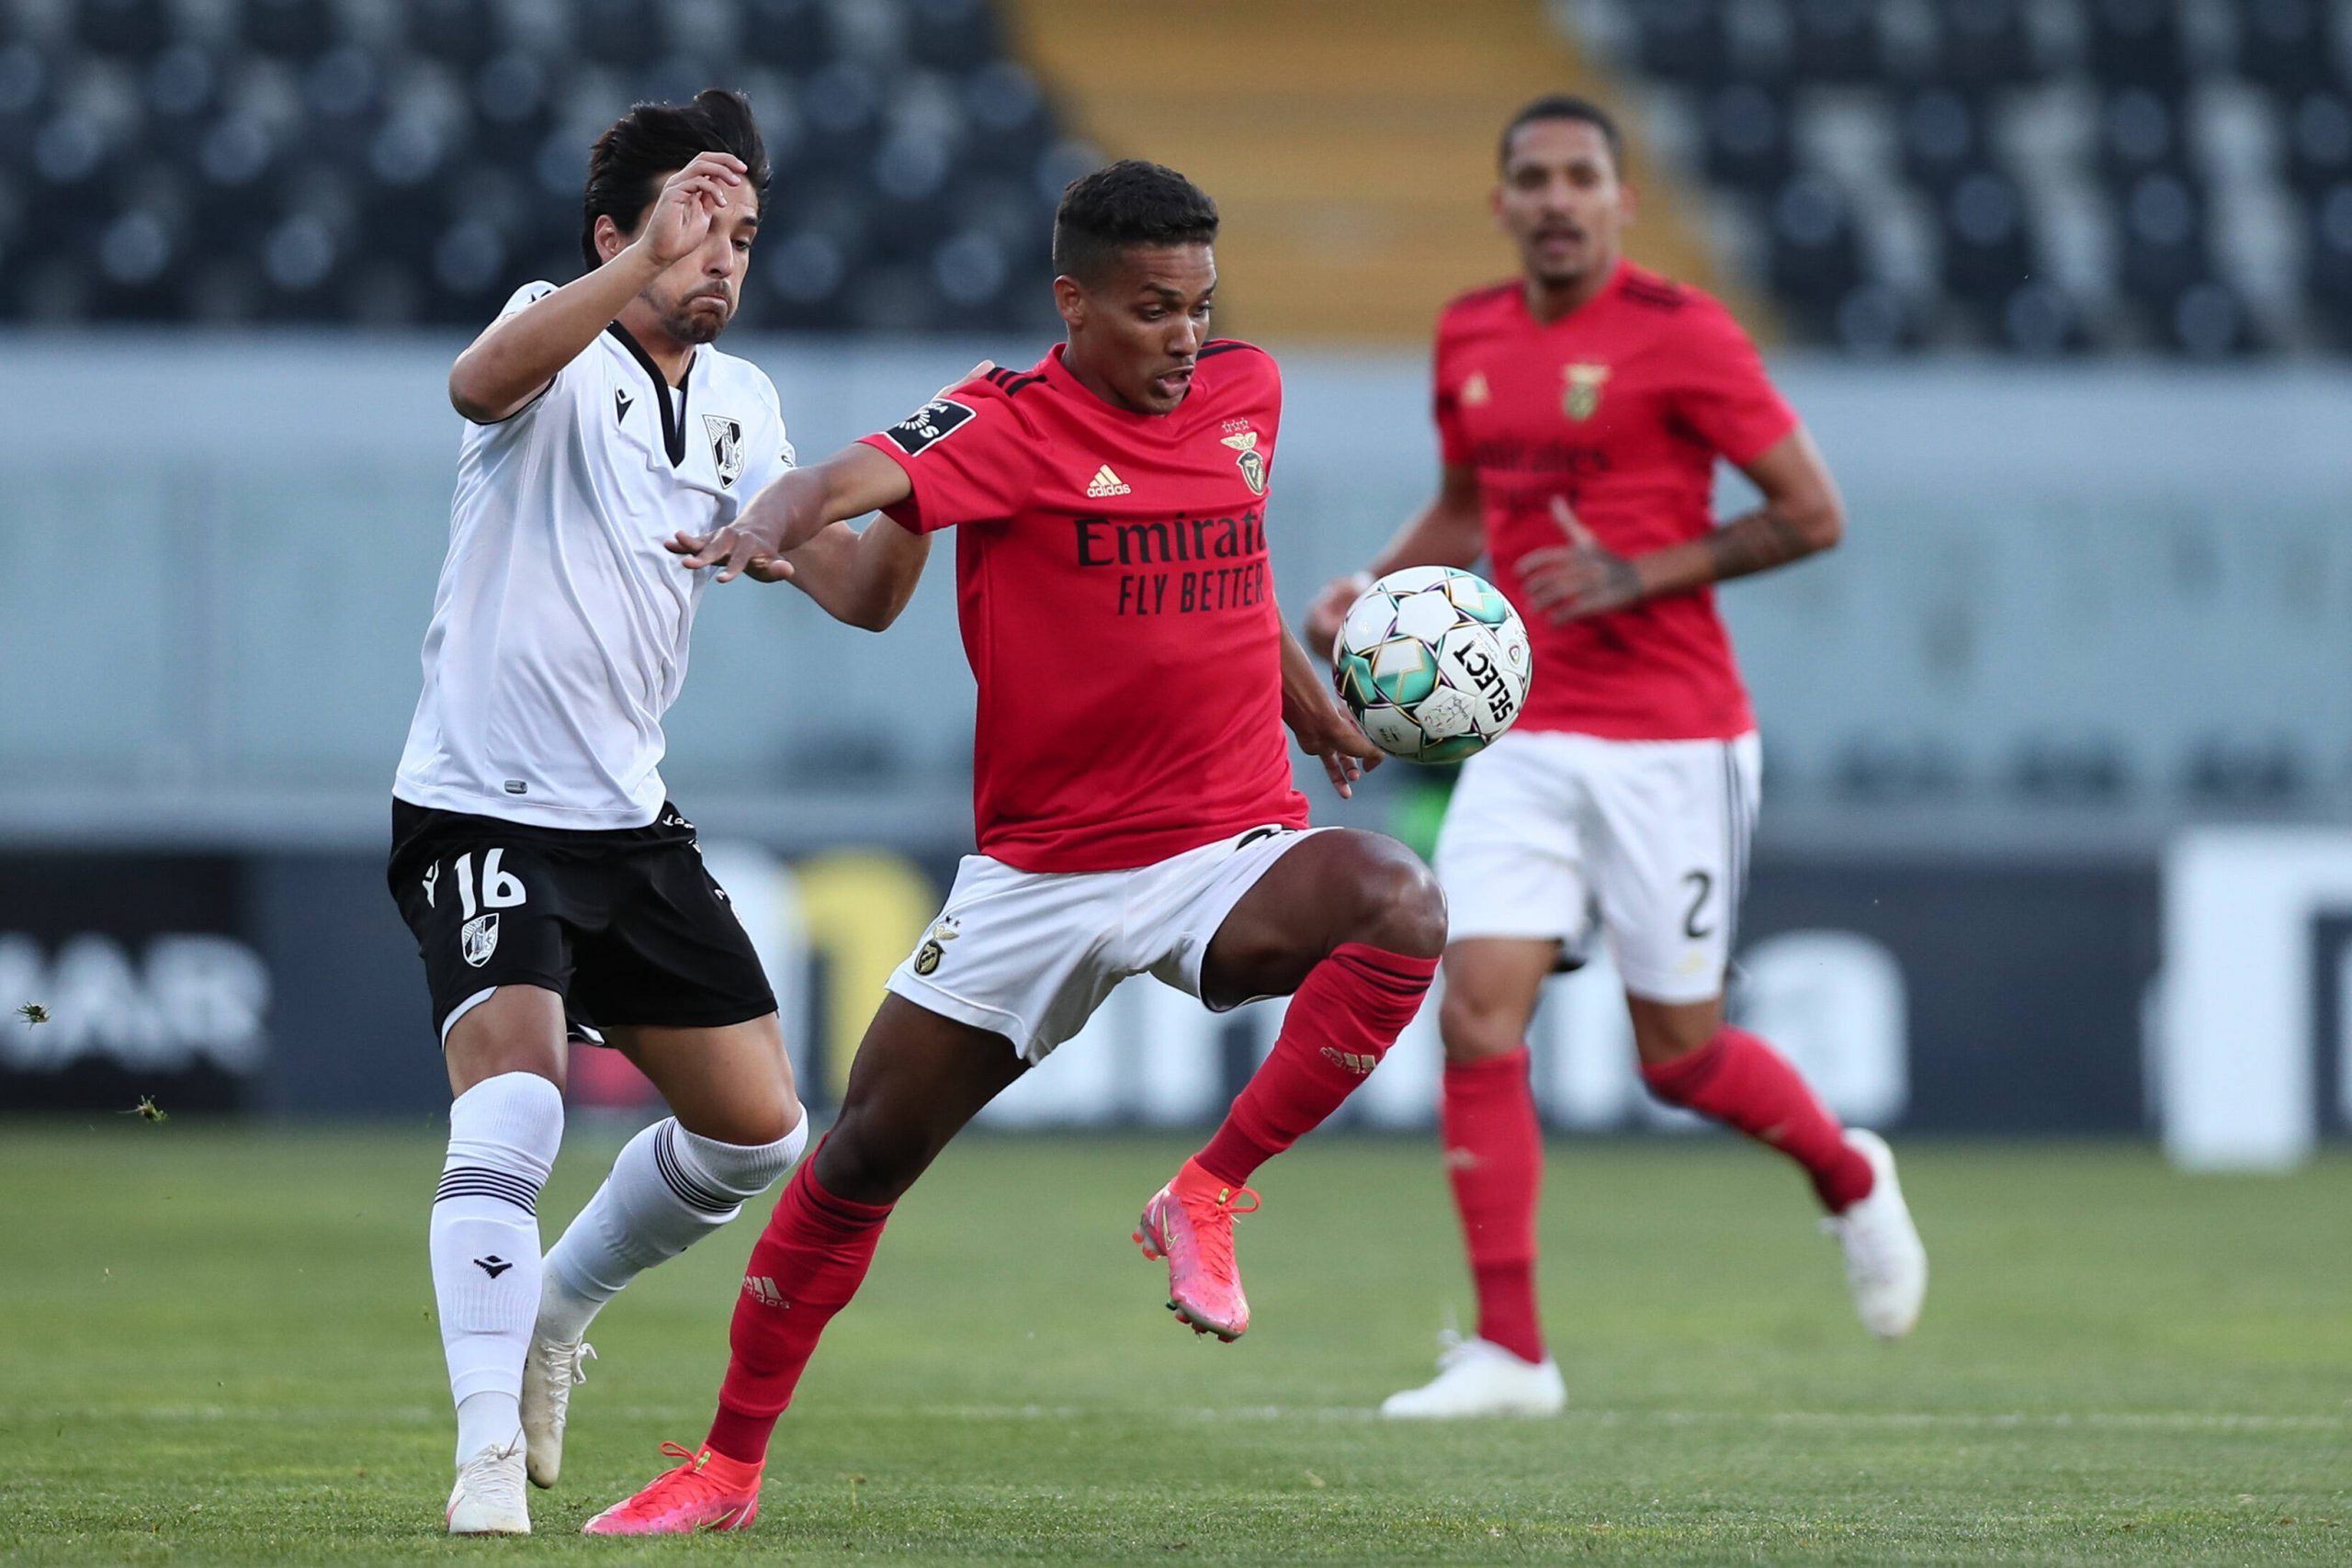 Pedrinho to Shakhtar: The latest Brazilian import scouted